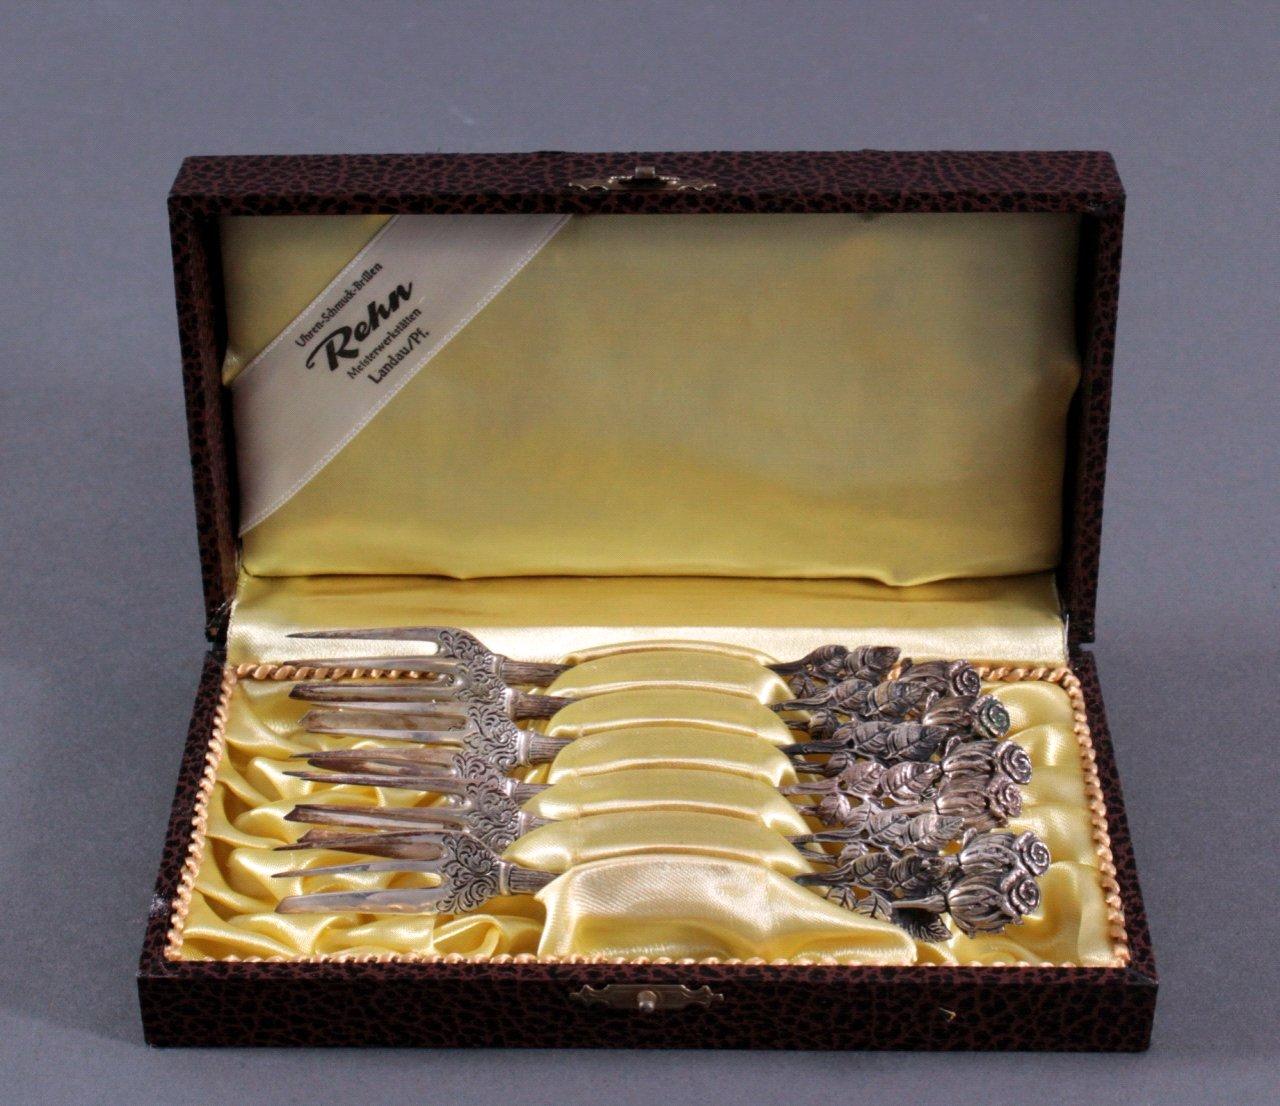 Hildesheimer Rose Kuchengabel, 800er Silber